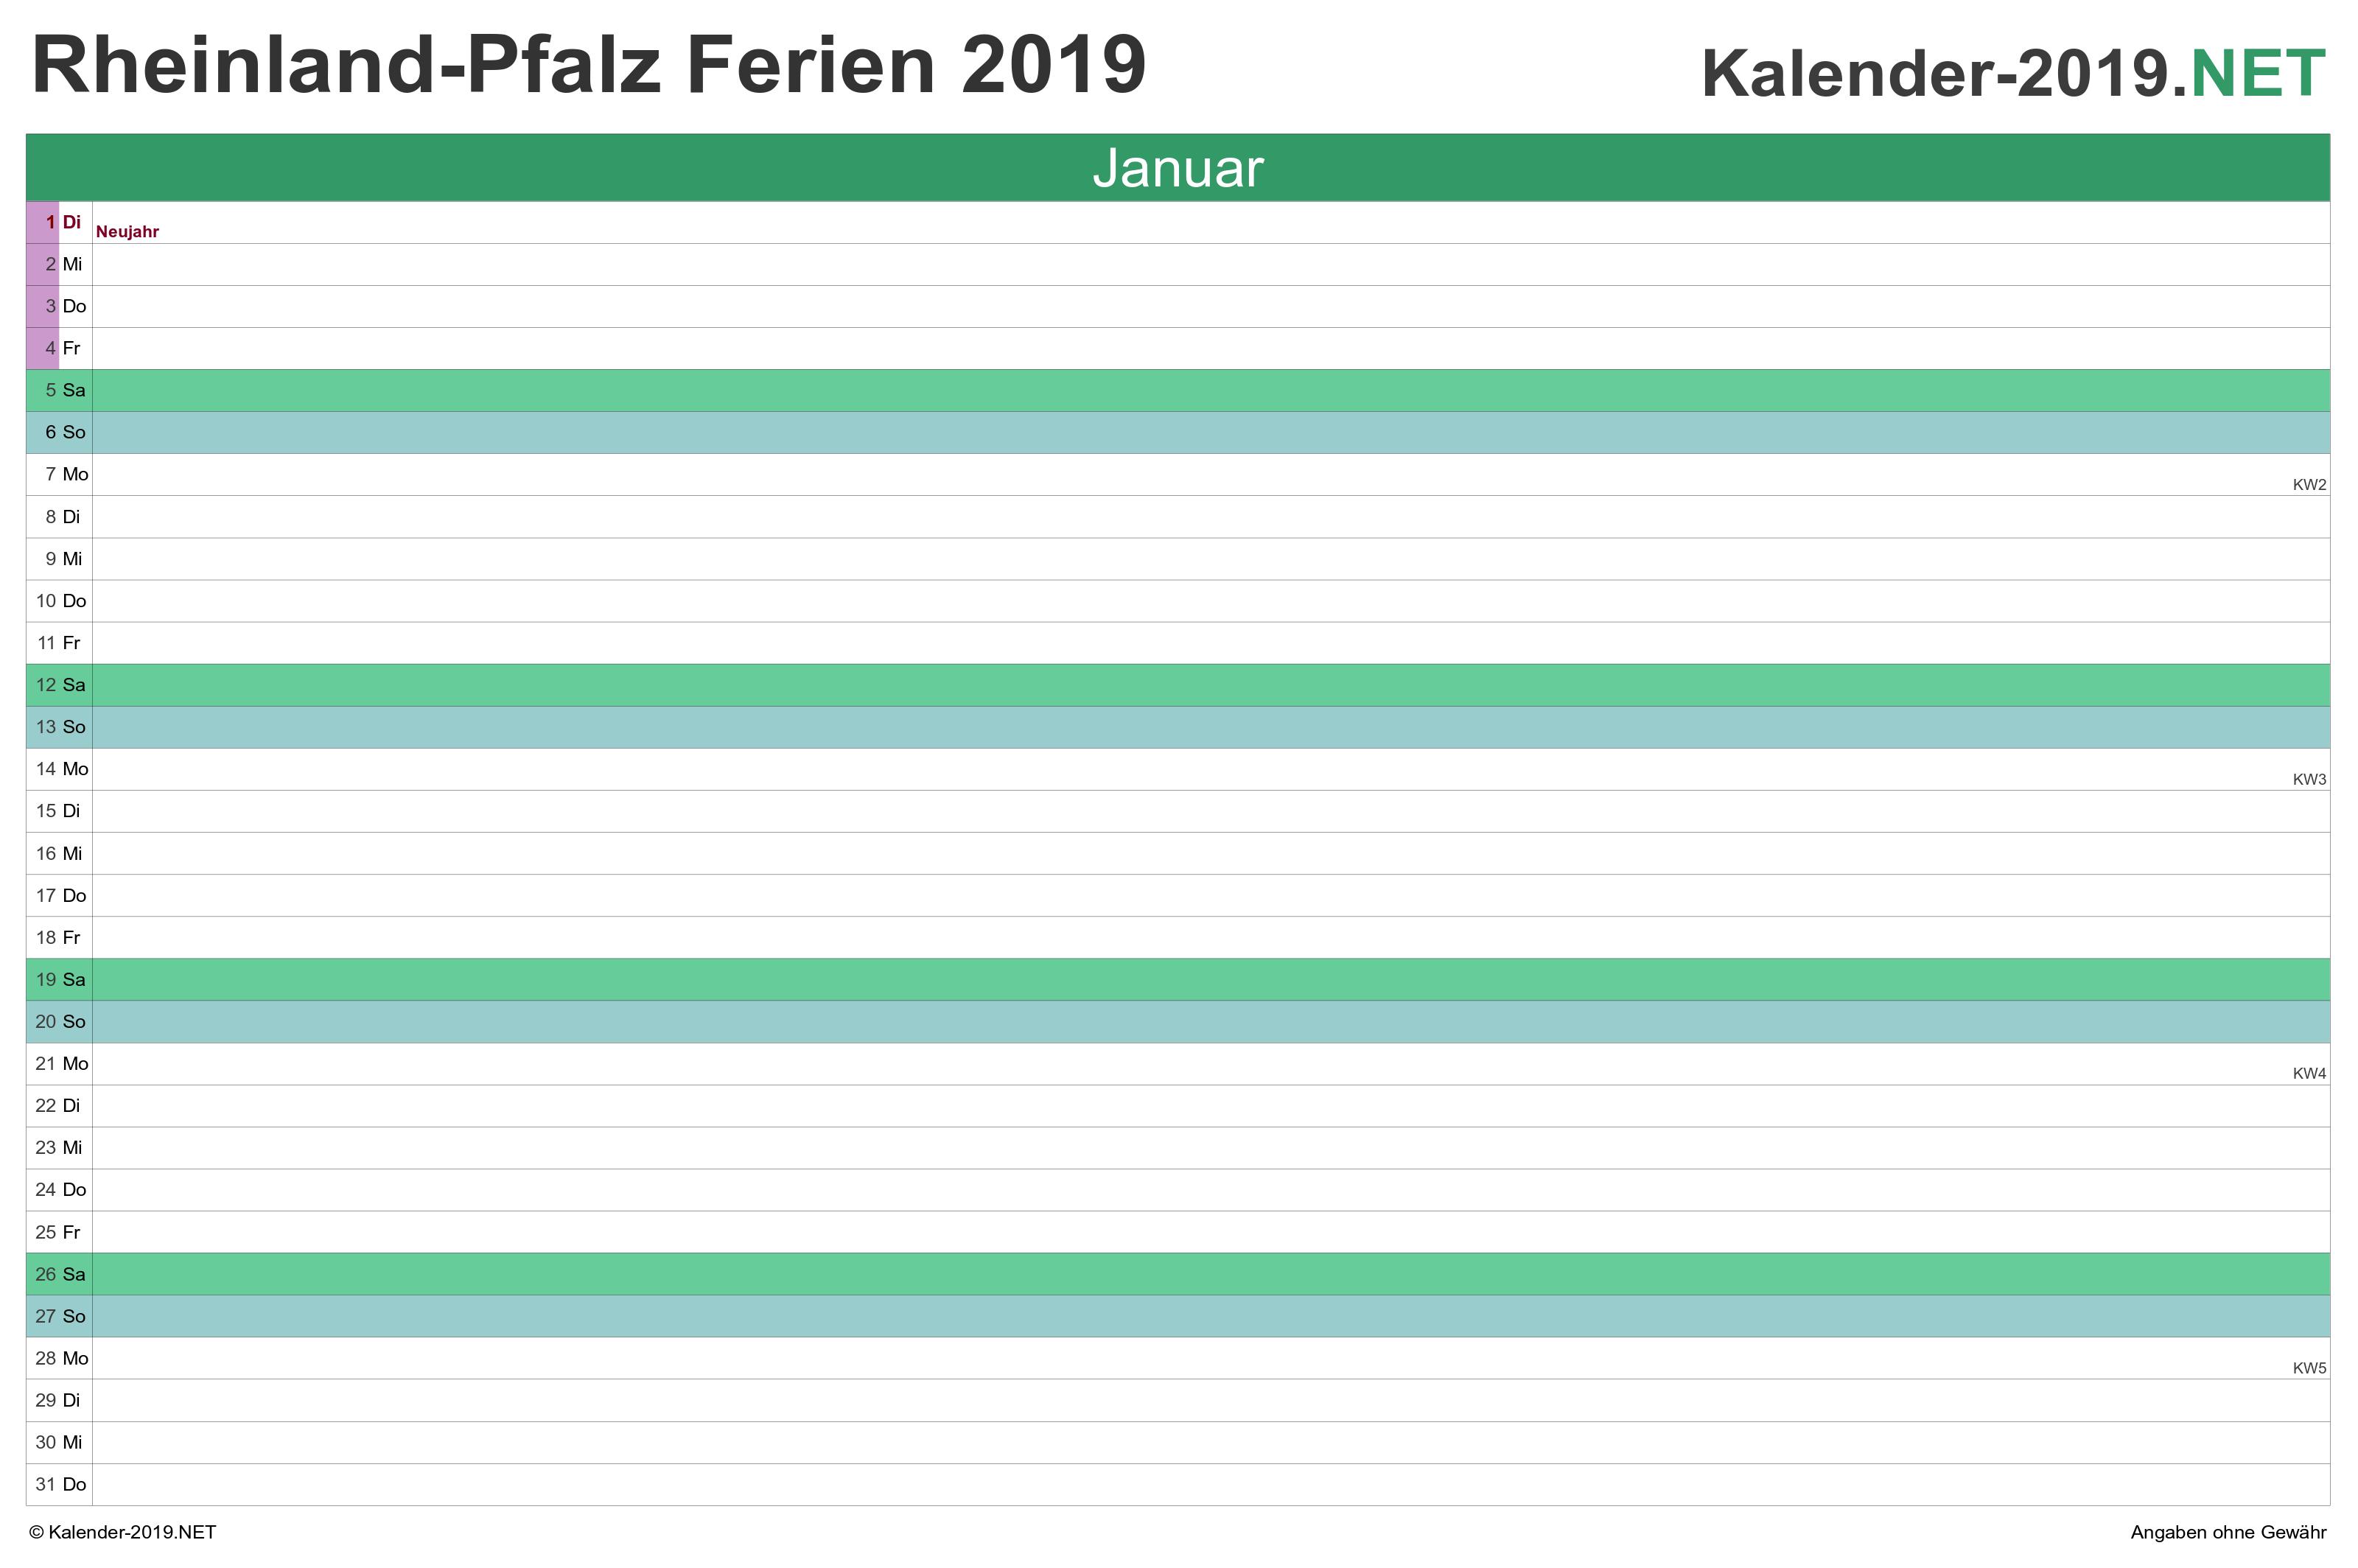 osterferien rheinland-pfalz 2019